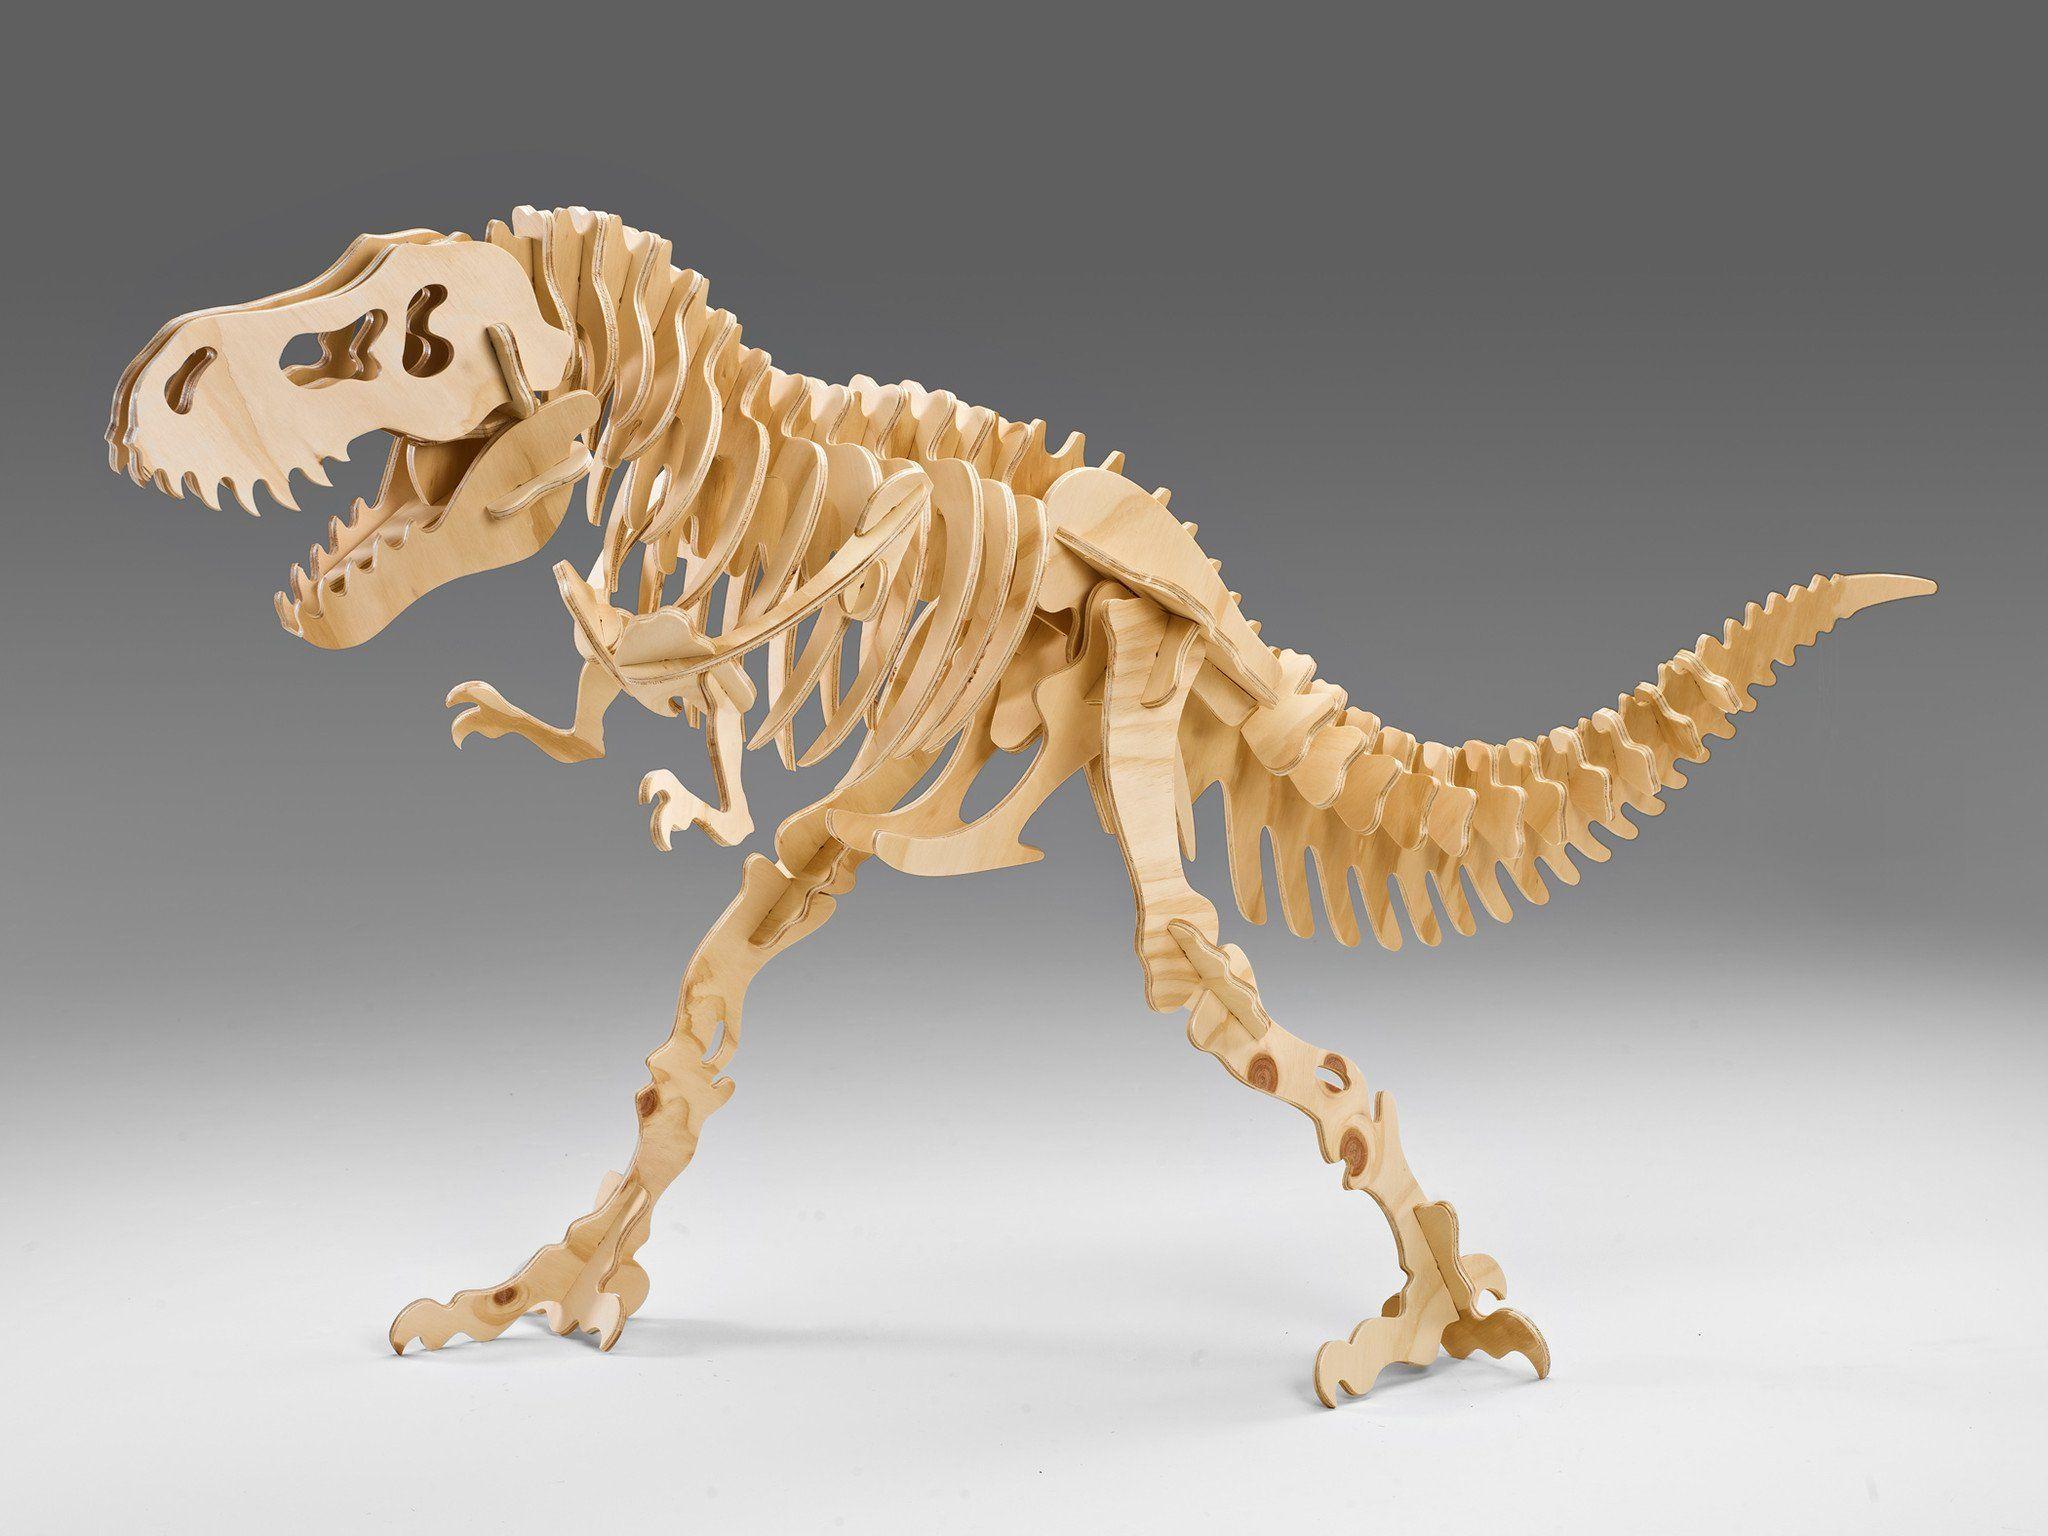 Attacking Tyrannosaurus Rex 3d Dinosaur Puzzle Wood Working